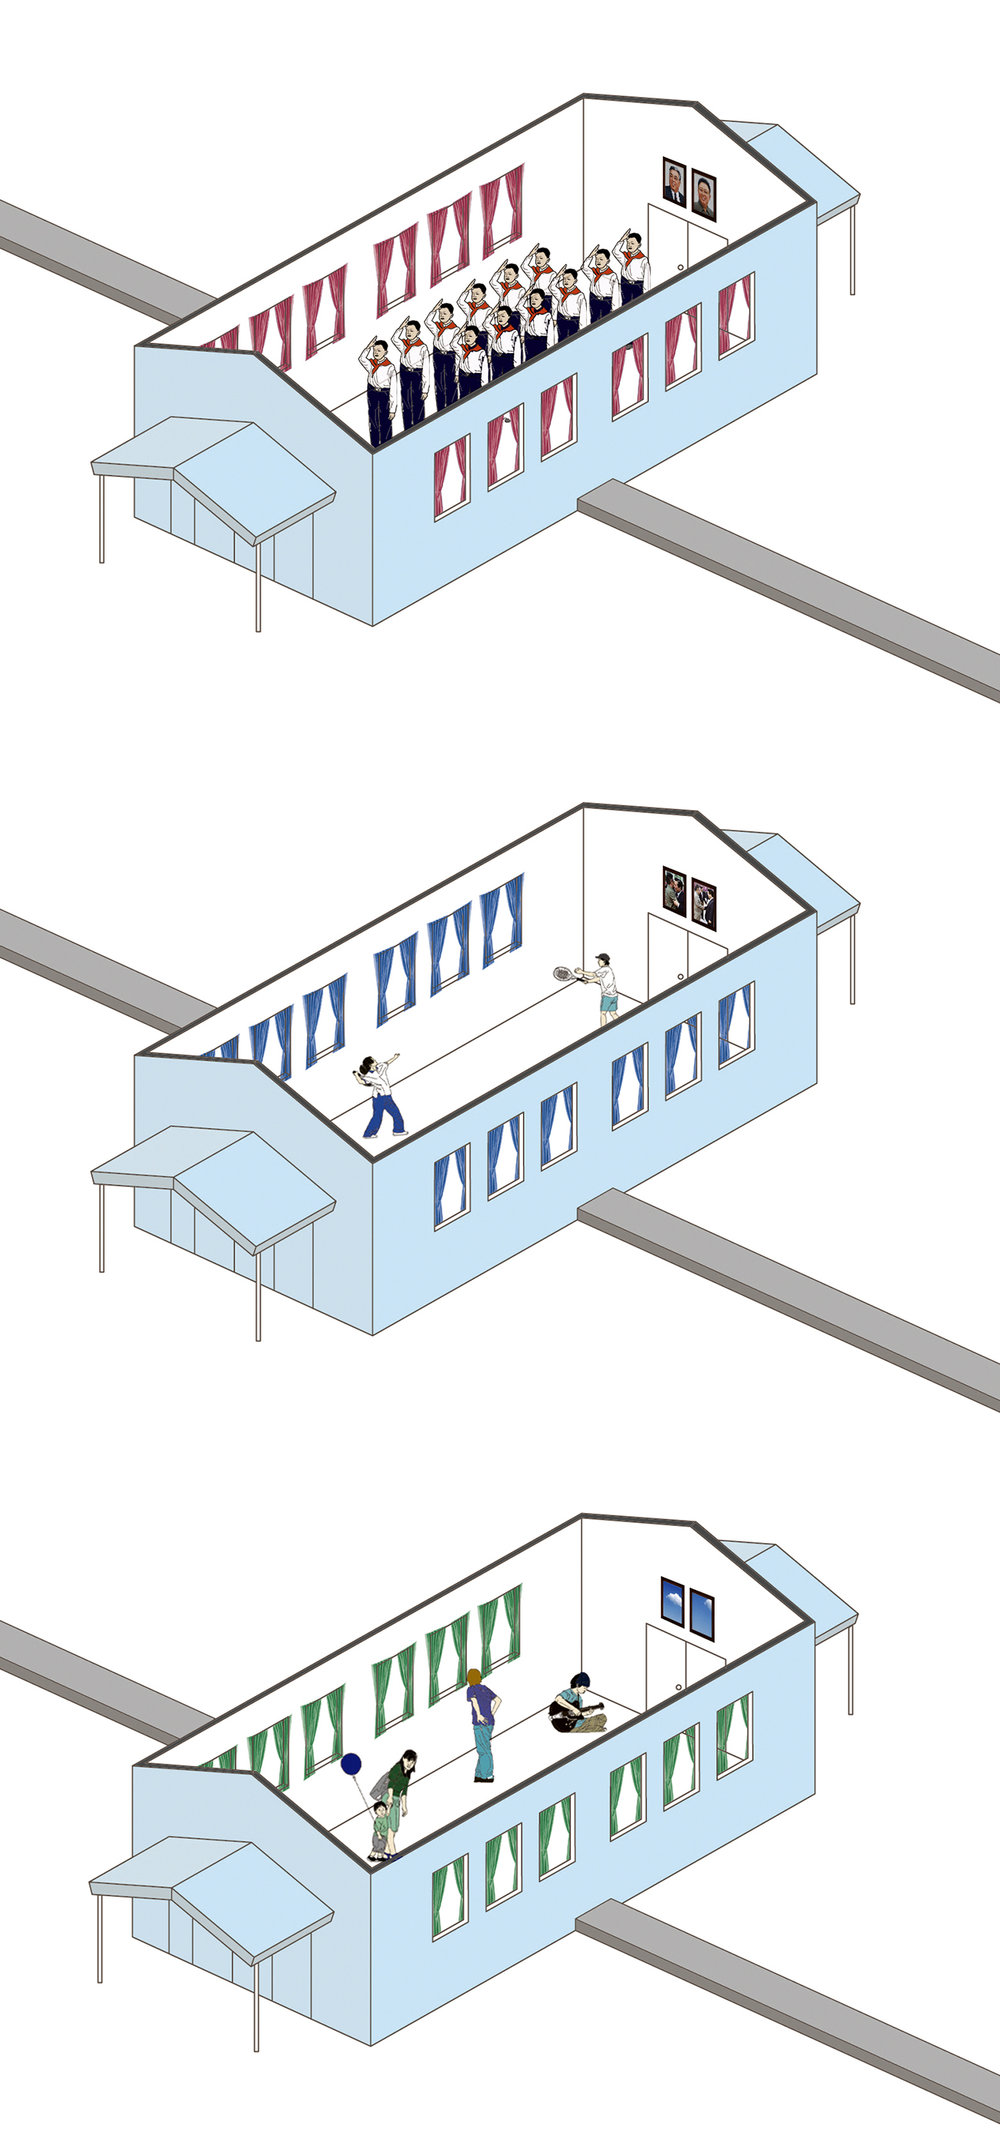 CONTEXTUAL DESIGN_SOYOUN KIM_05_BLUE NEUTRALIZED ZONE_CUM LAUDE.jpg